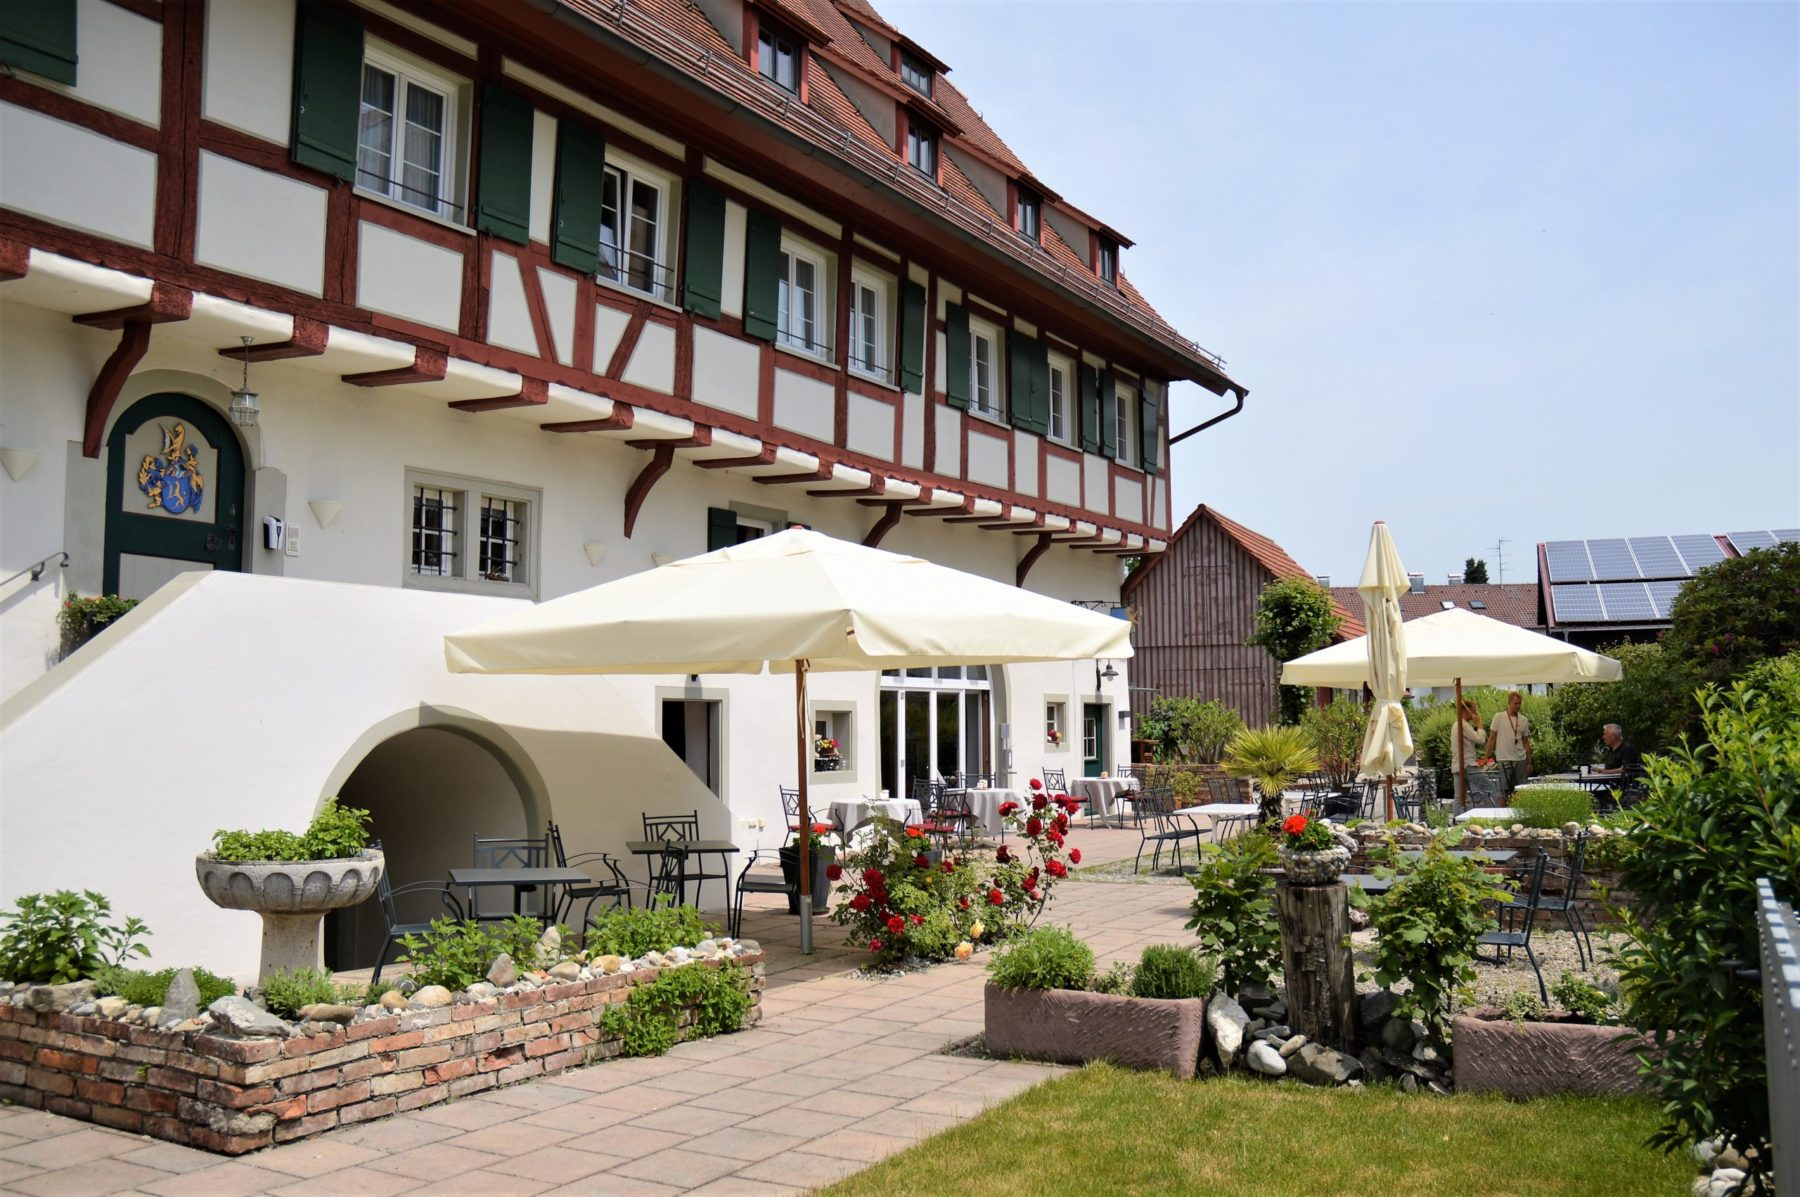 Seehotel Amtshof am Bodensee